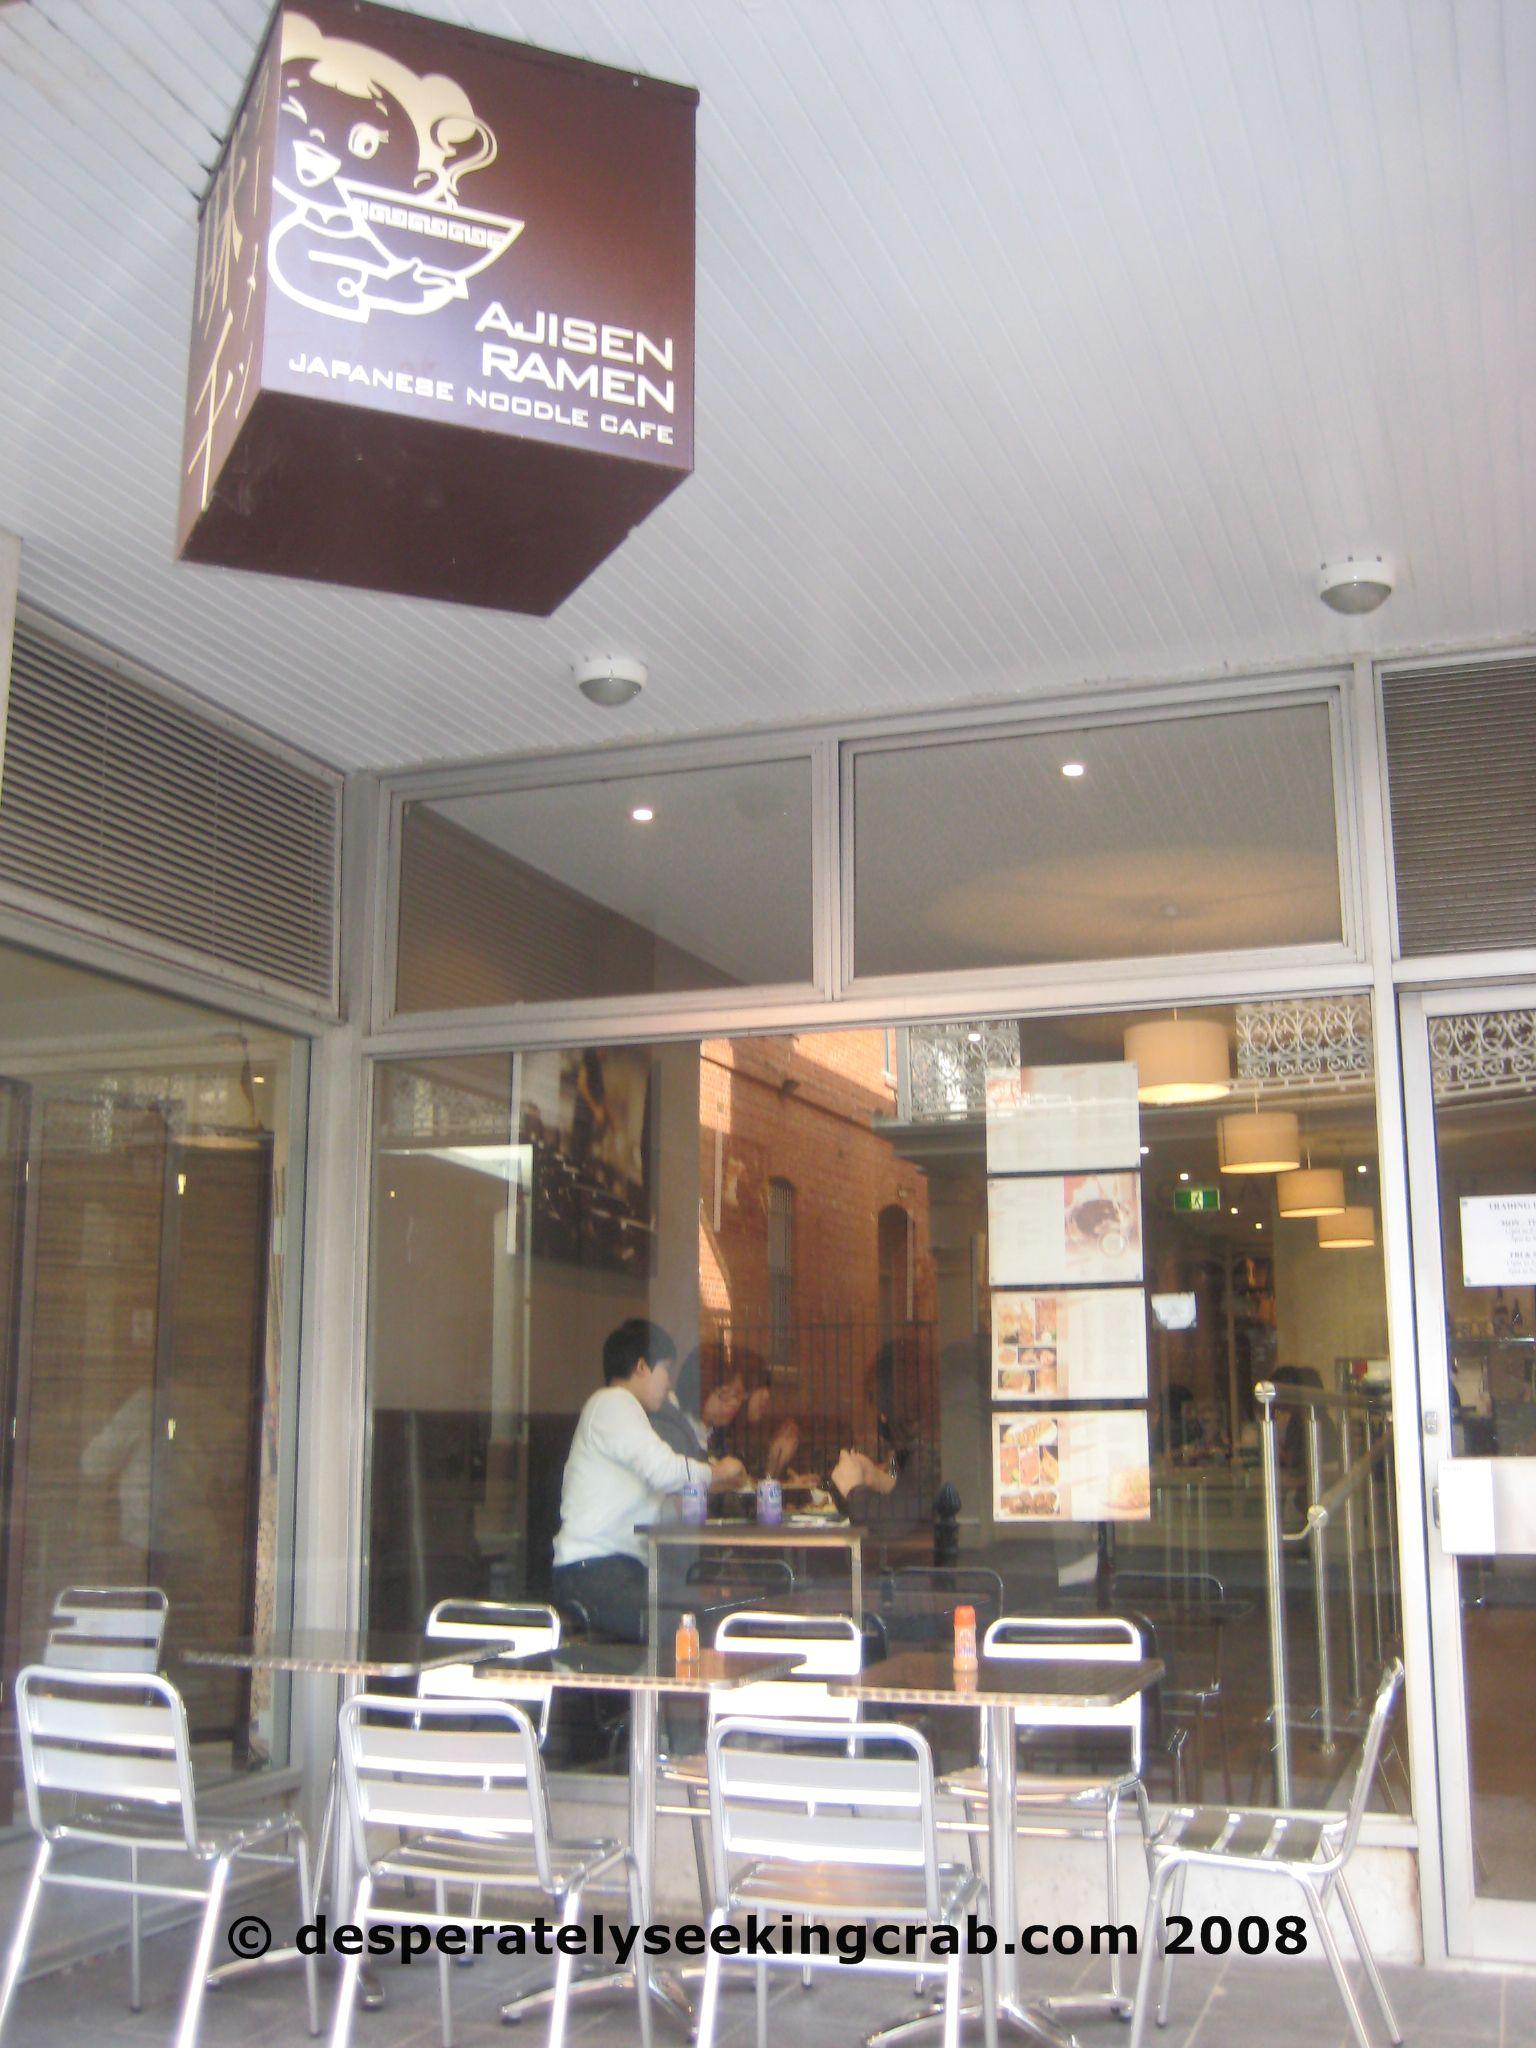 Outside Ajisen